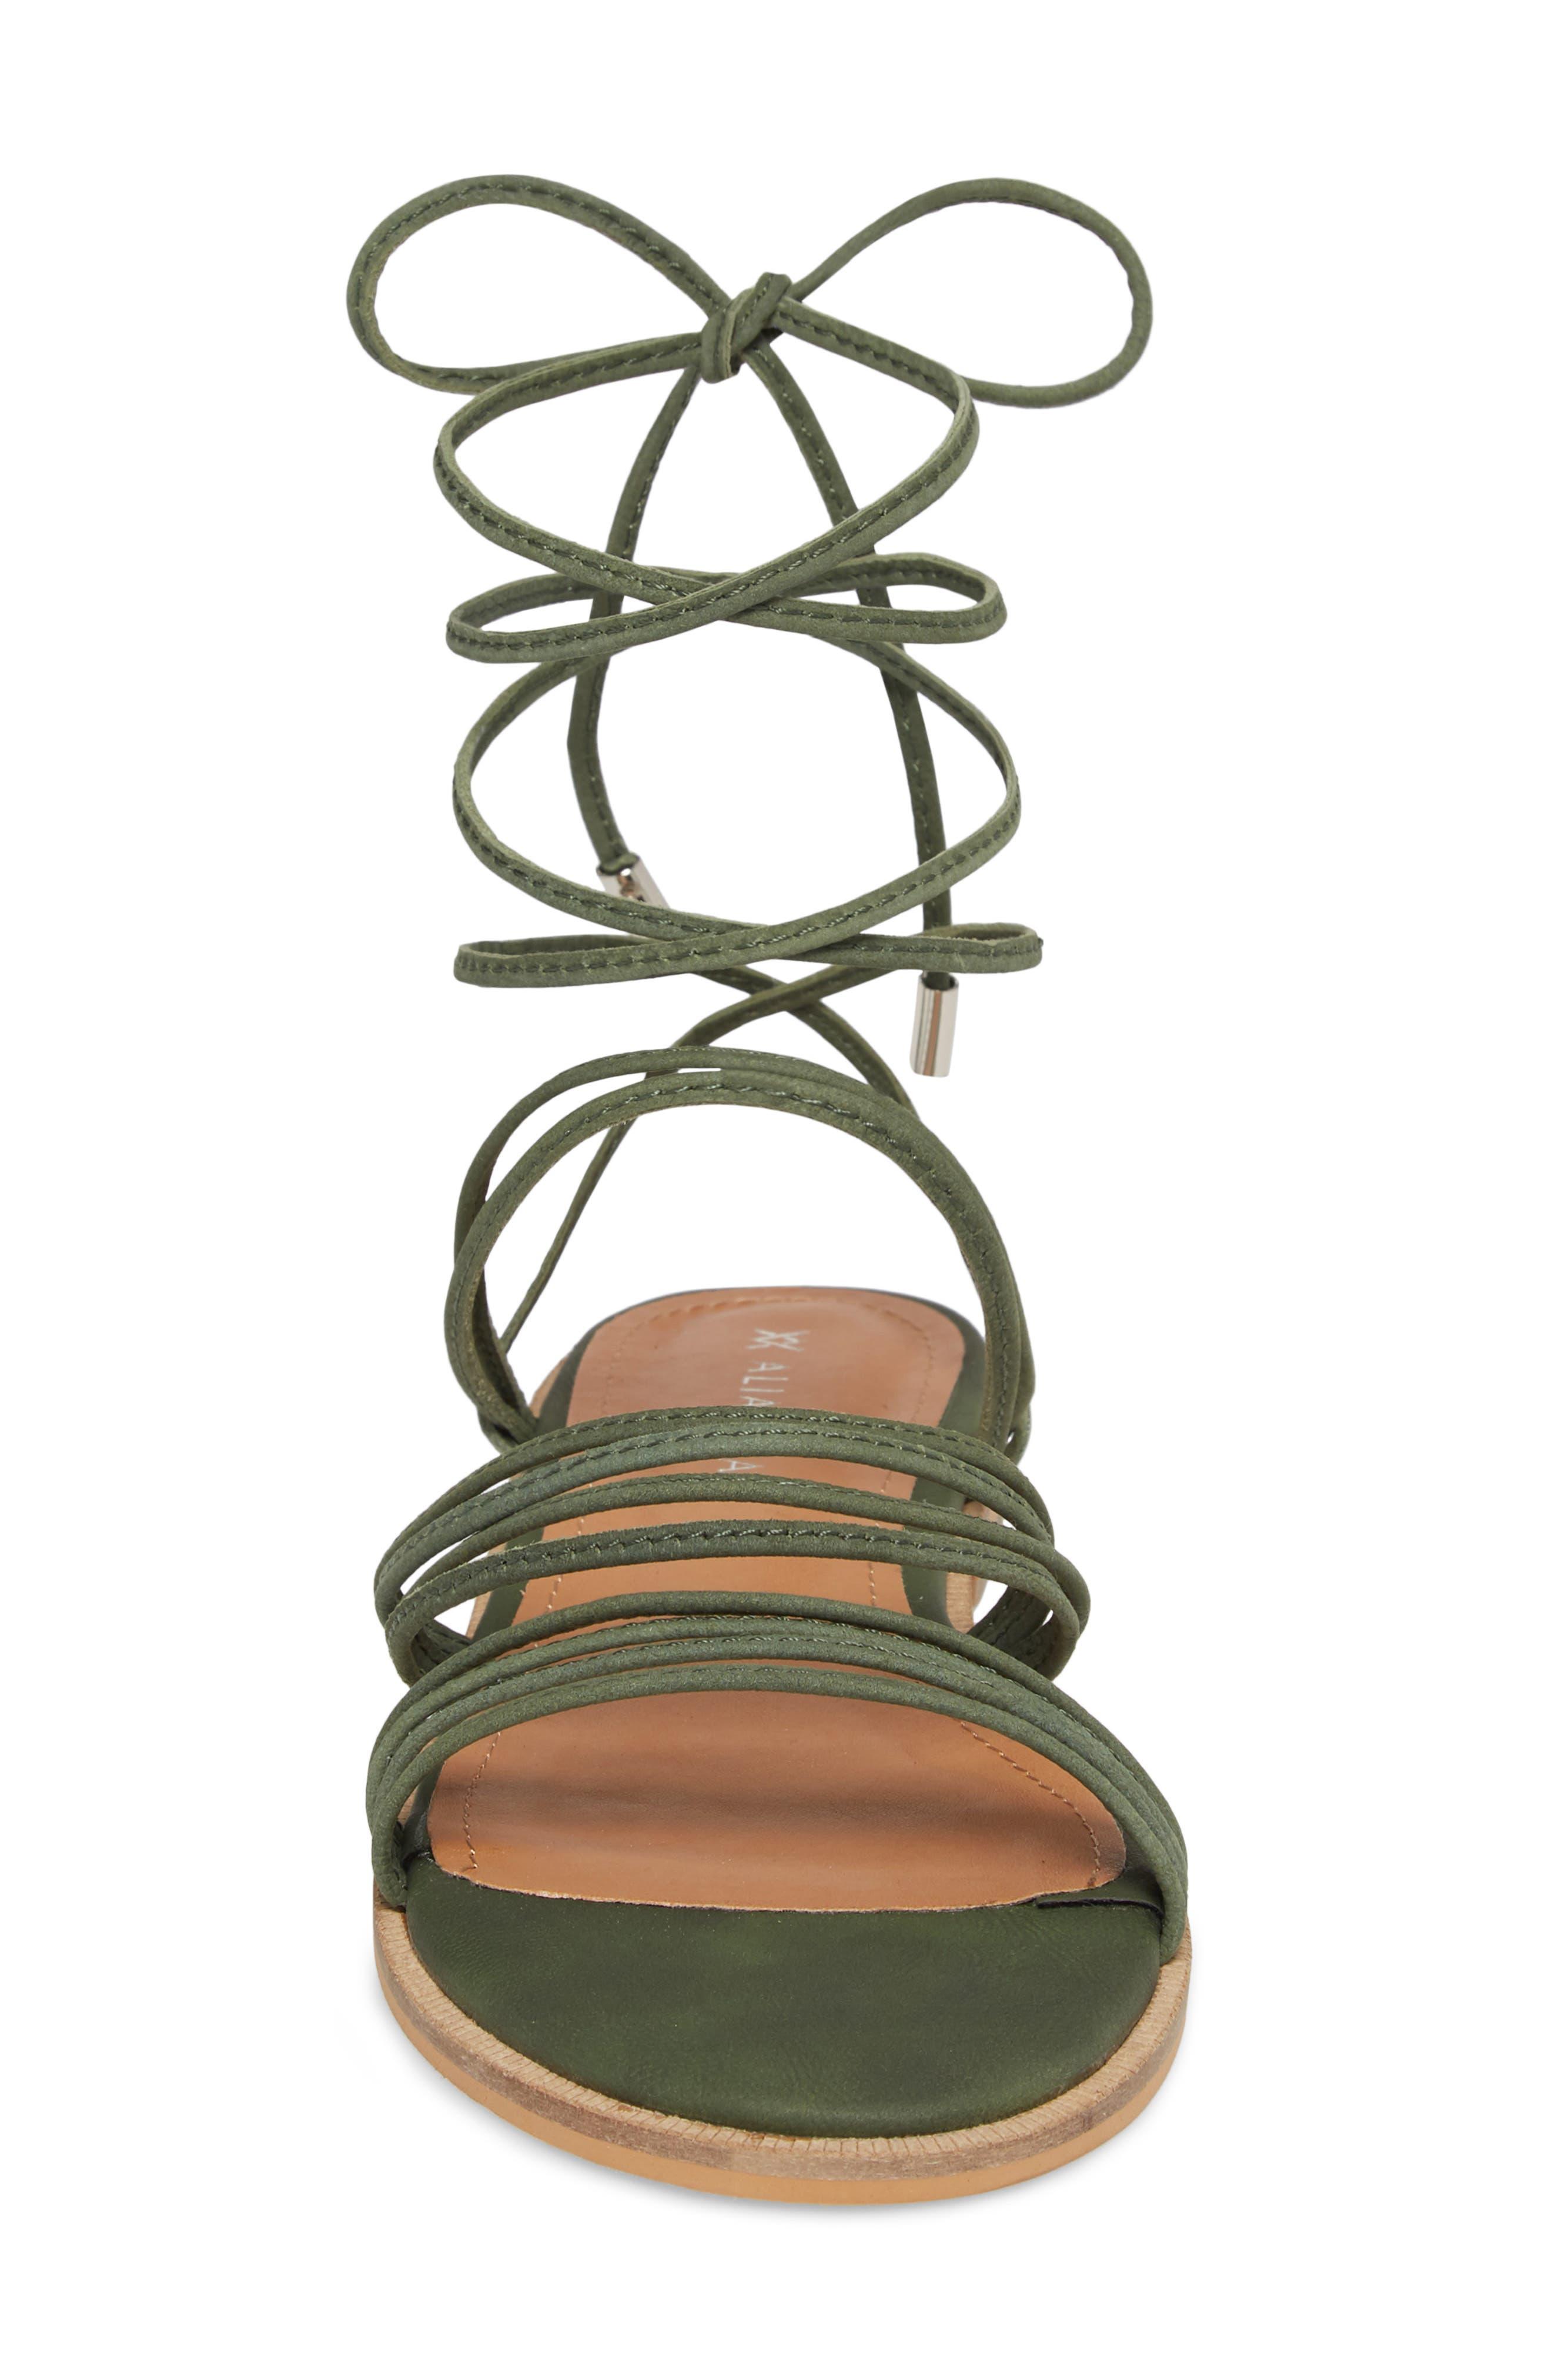 Theory Strappy Flat Sandal,                             Alternate thumbnail 4, color,                             Khaki Leather